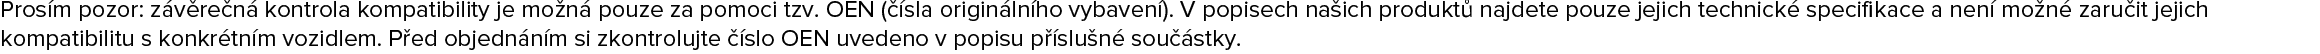 TOPRAN 0164 30, 0313 38, 7703 062 062, 1113 7 546 275, 7 546 275 Tesnici krouzek, olejova vypousteci zatka